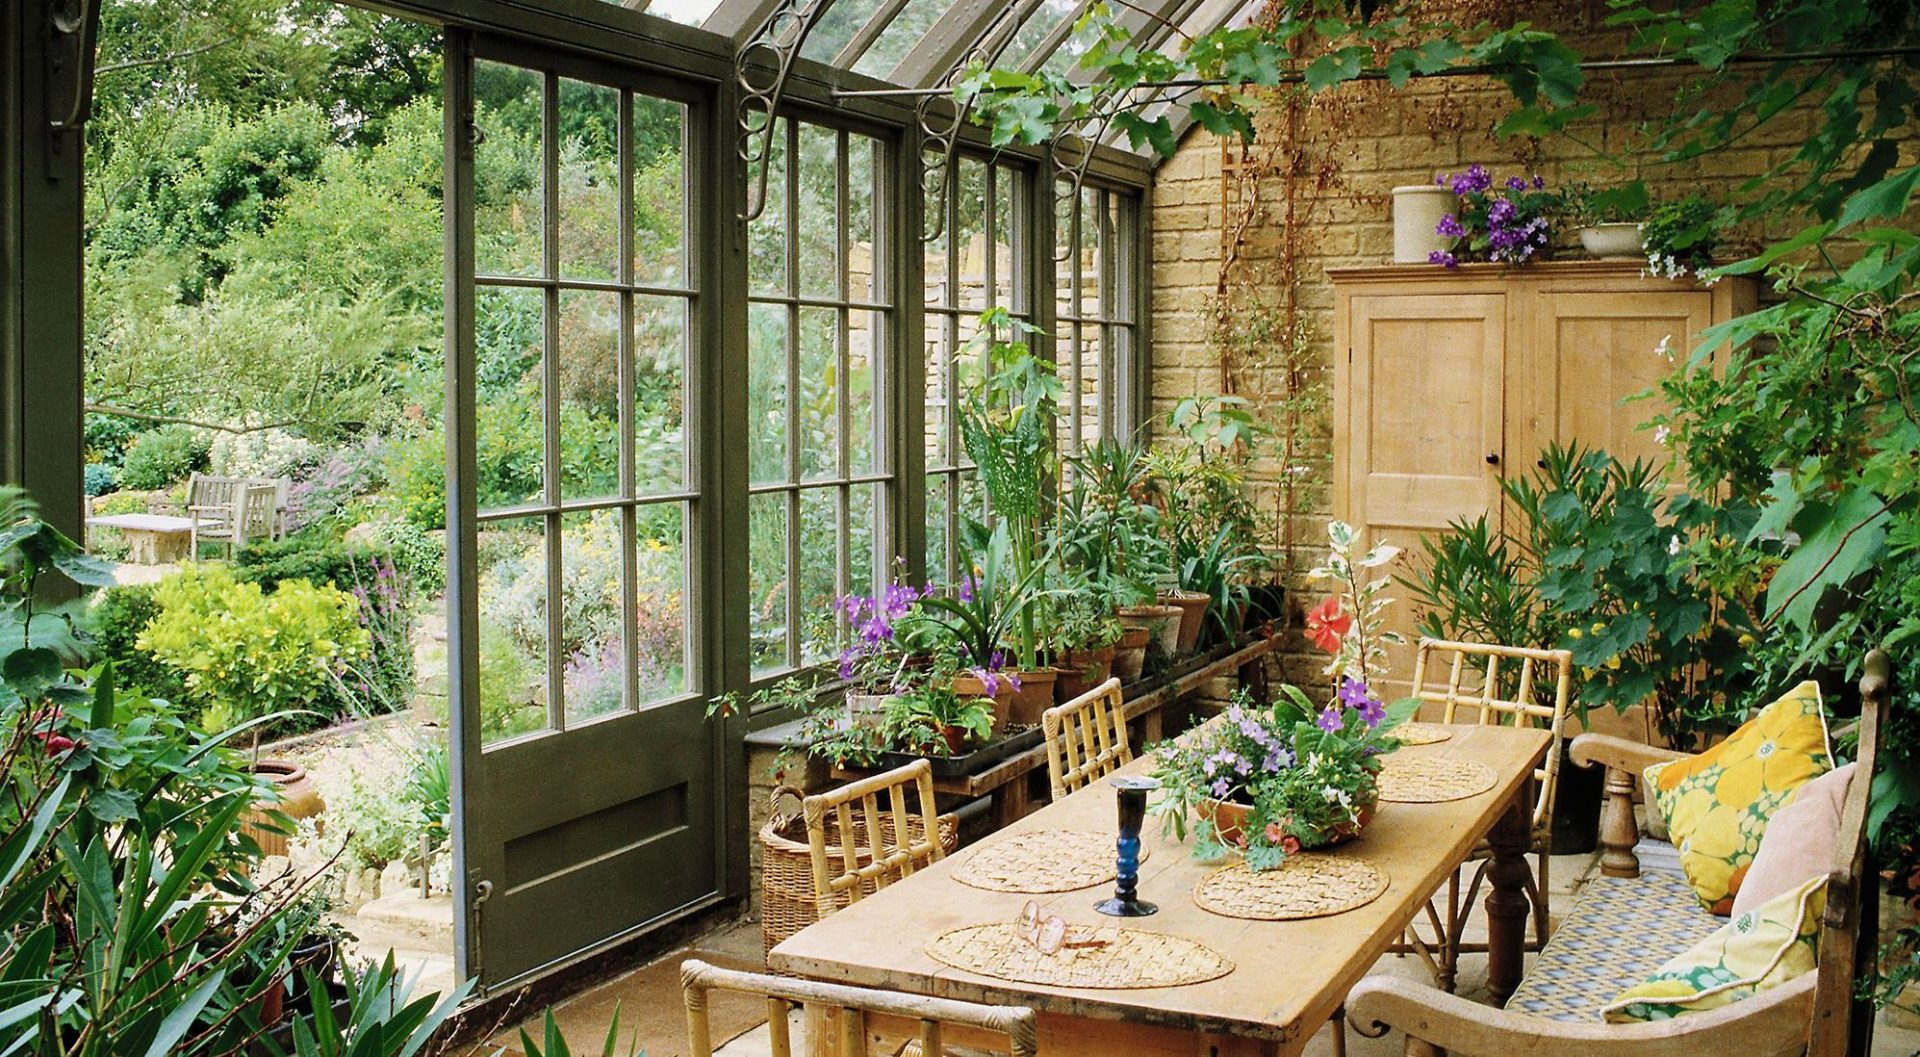 zahrada-drevo-rastliny-kvetiny-nabytok-okna-stol-stolicky-stolovanie